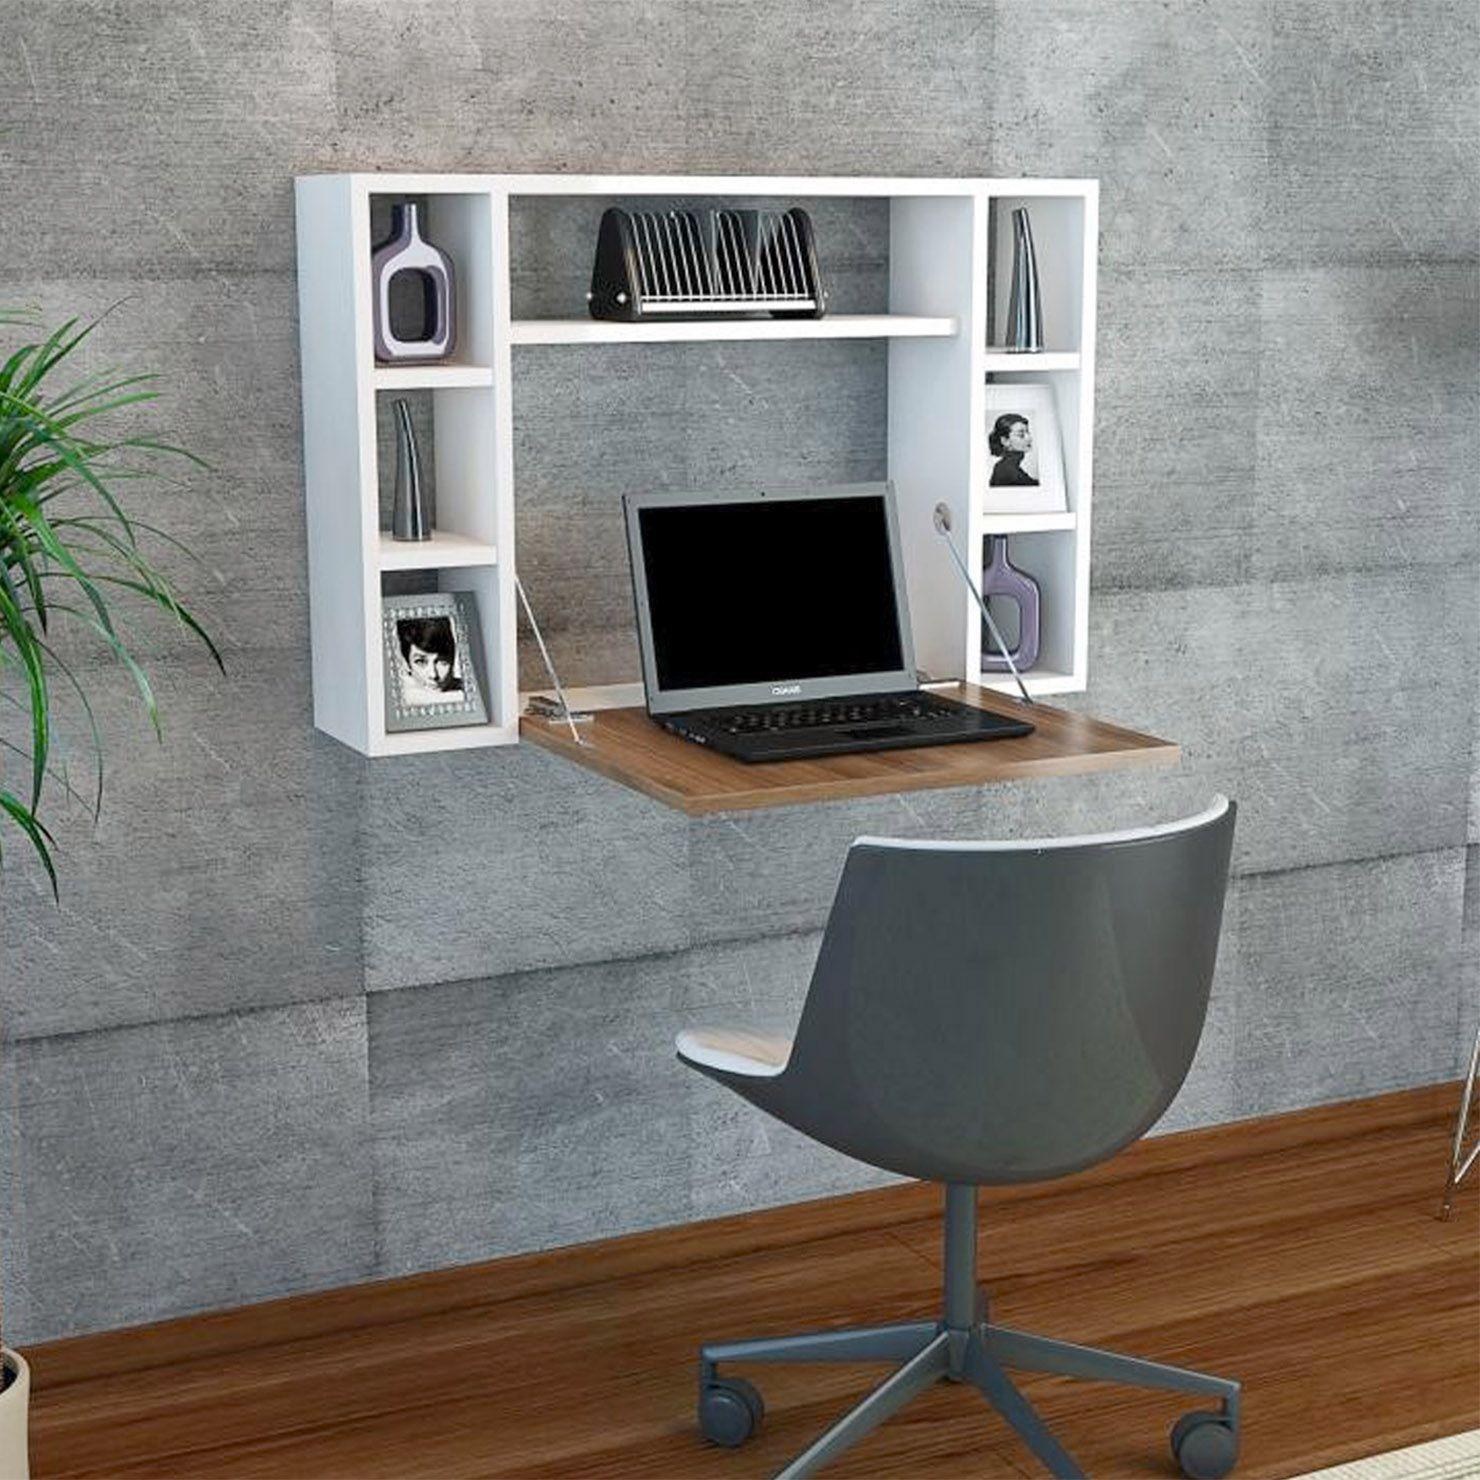 Omega Wall Desk, White/Brown Floating desk